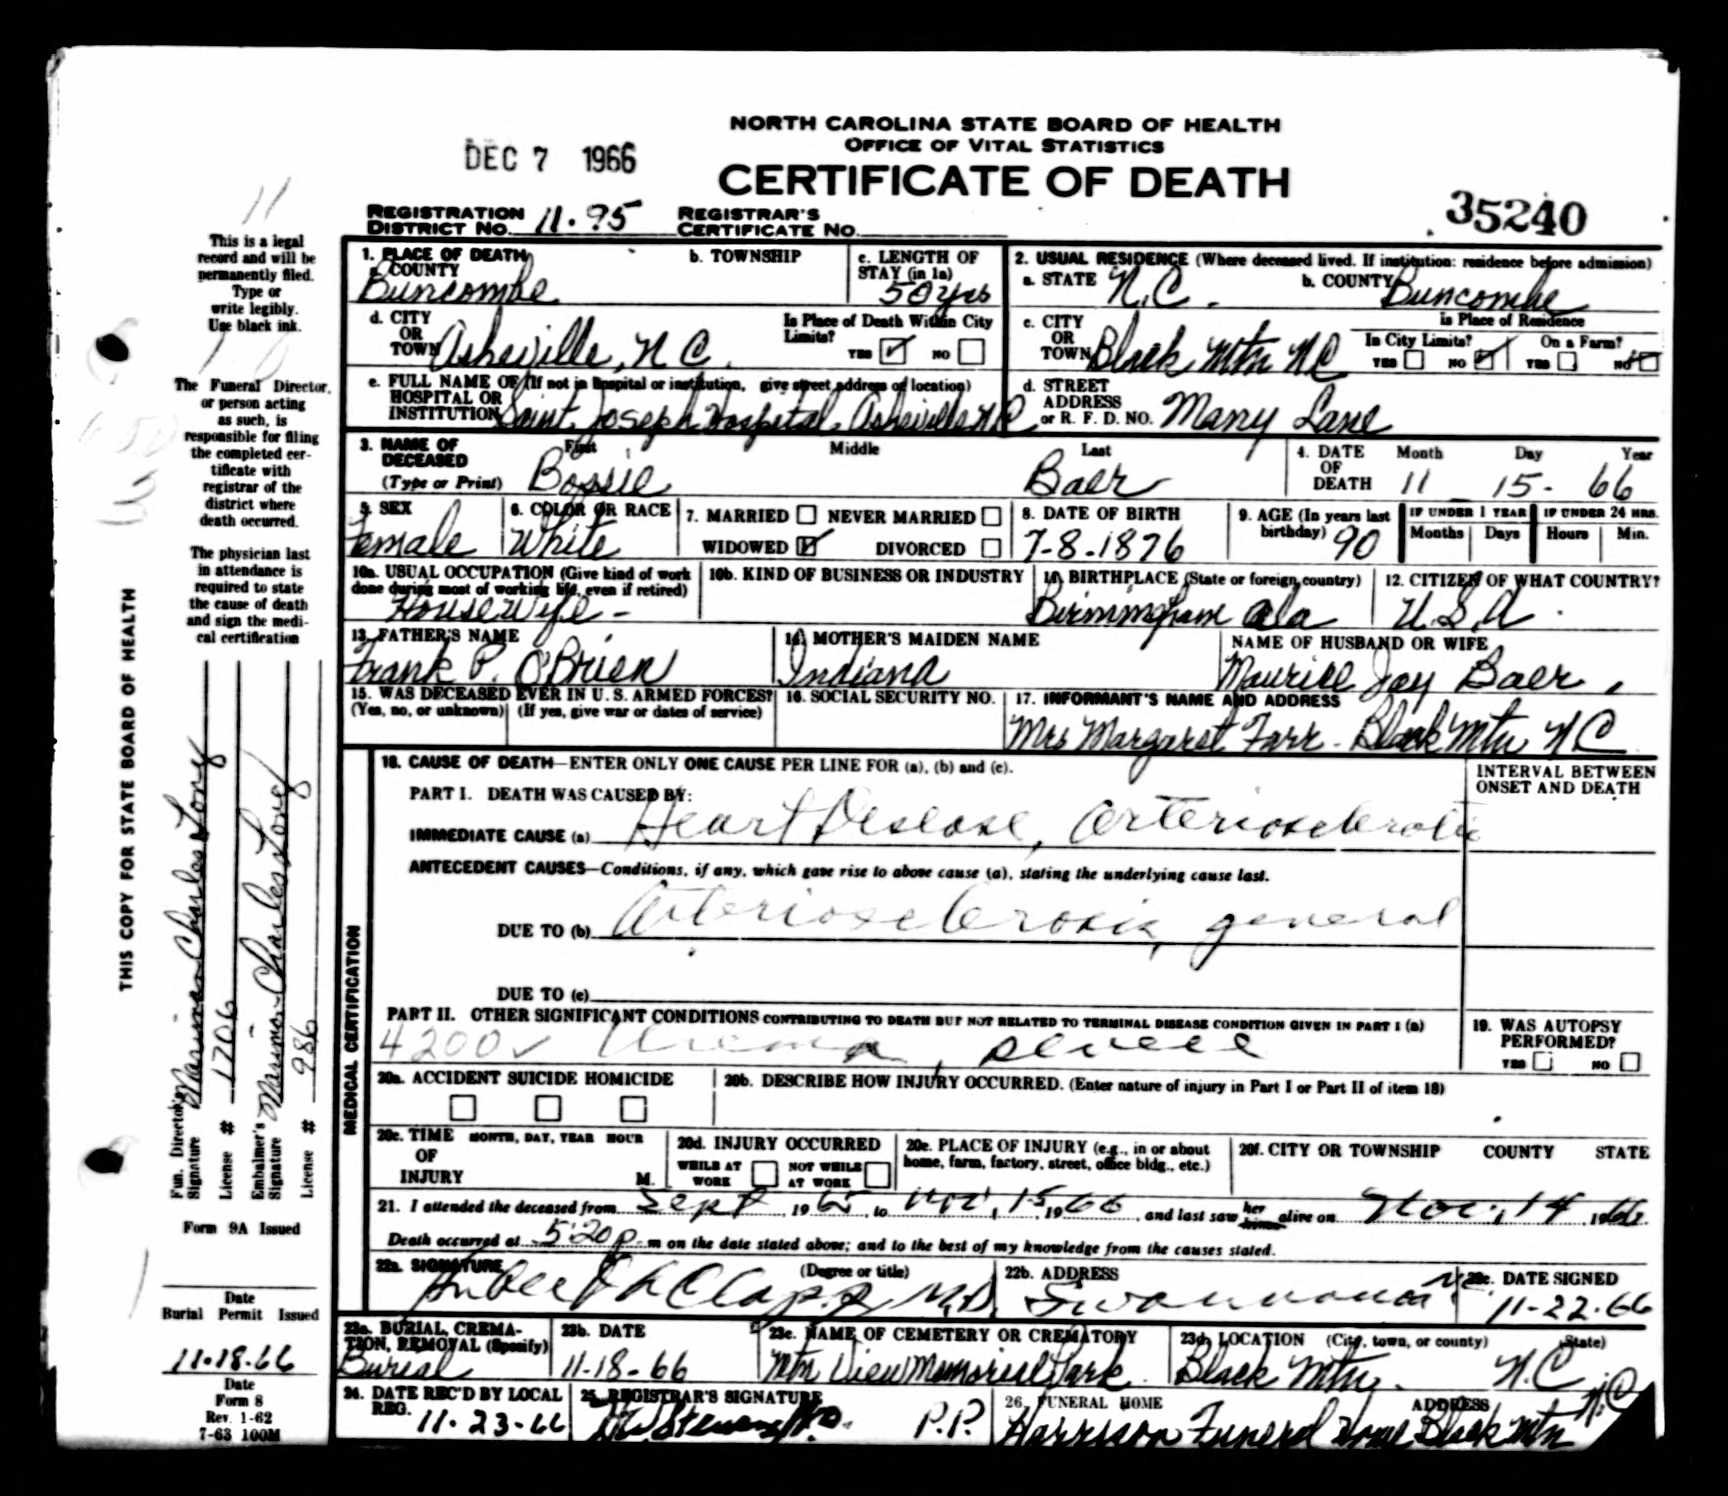 Oscar hundley brotmanblog a family journey bossie baer death certificate ancestry north carolina death certificates 1909 xflitez Gallery